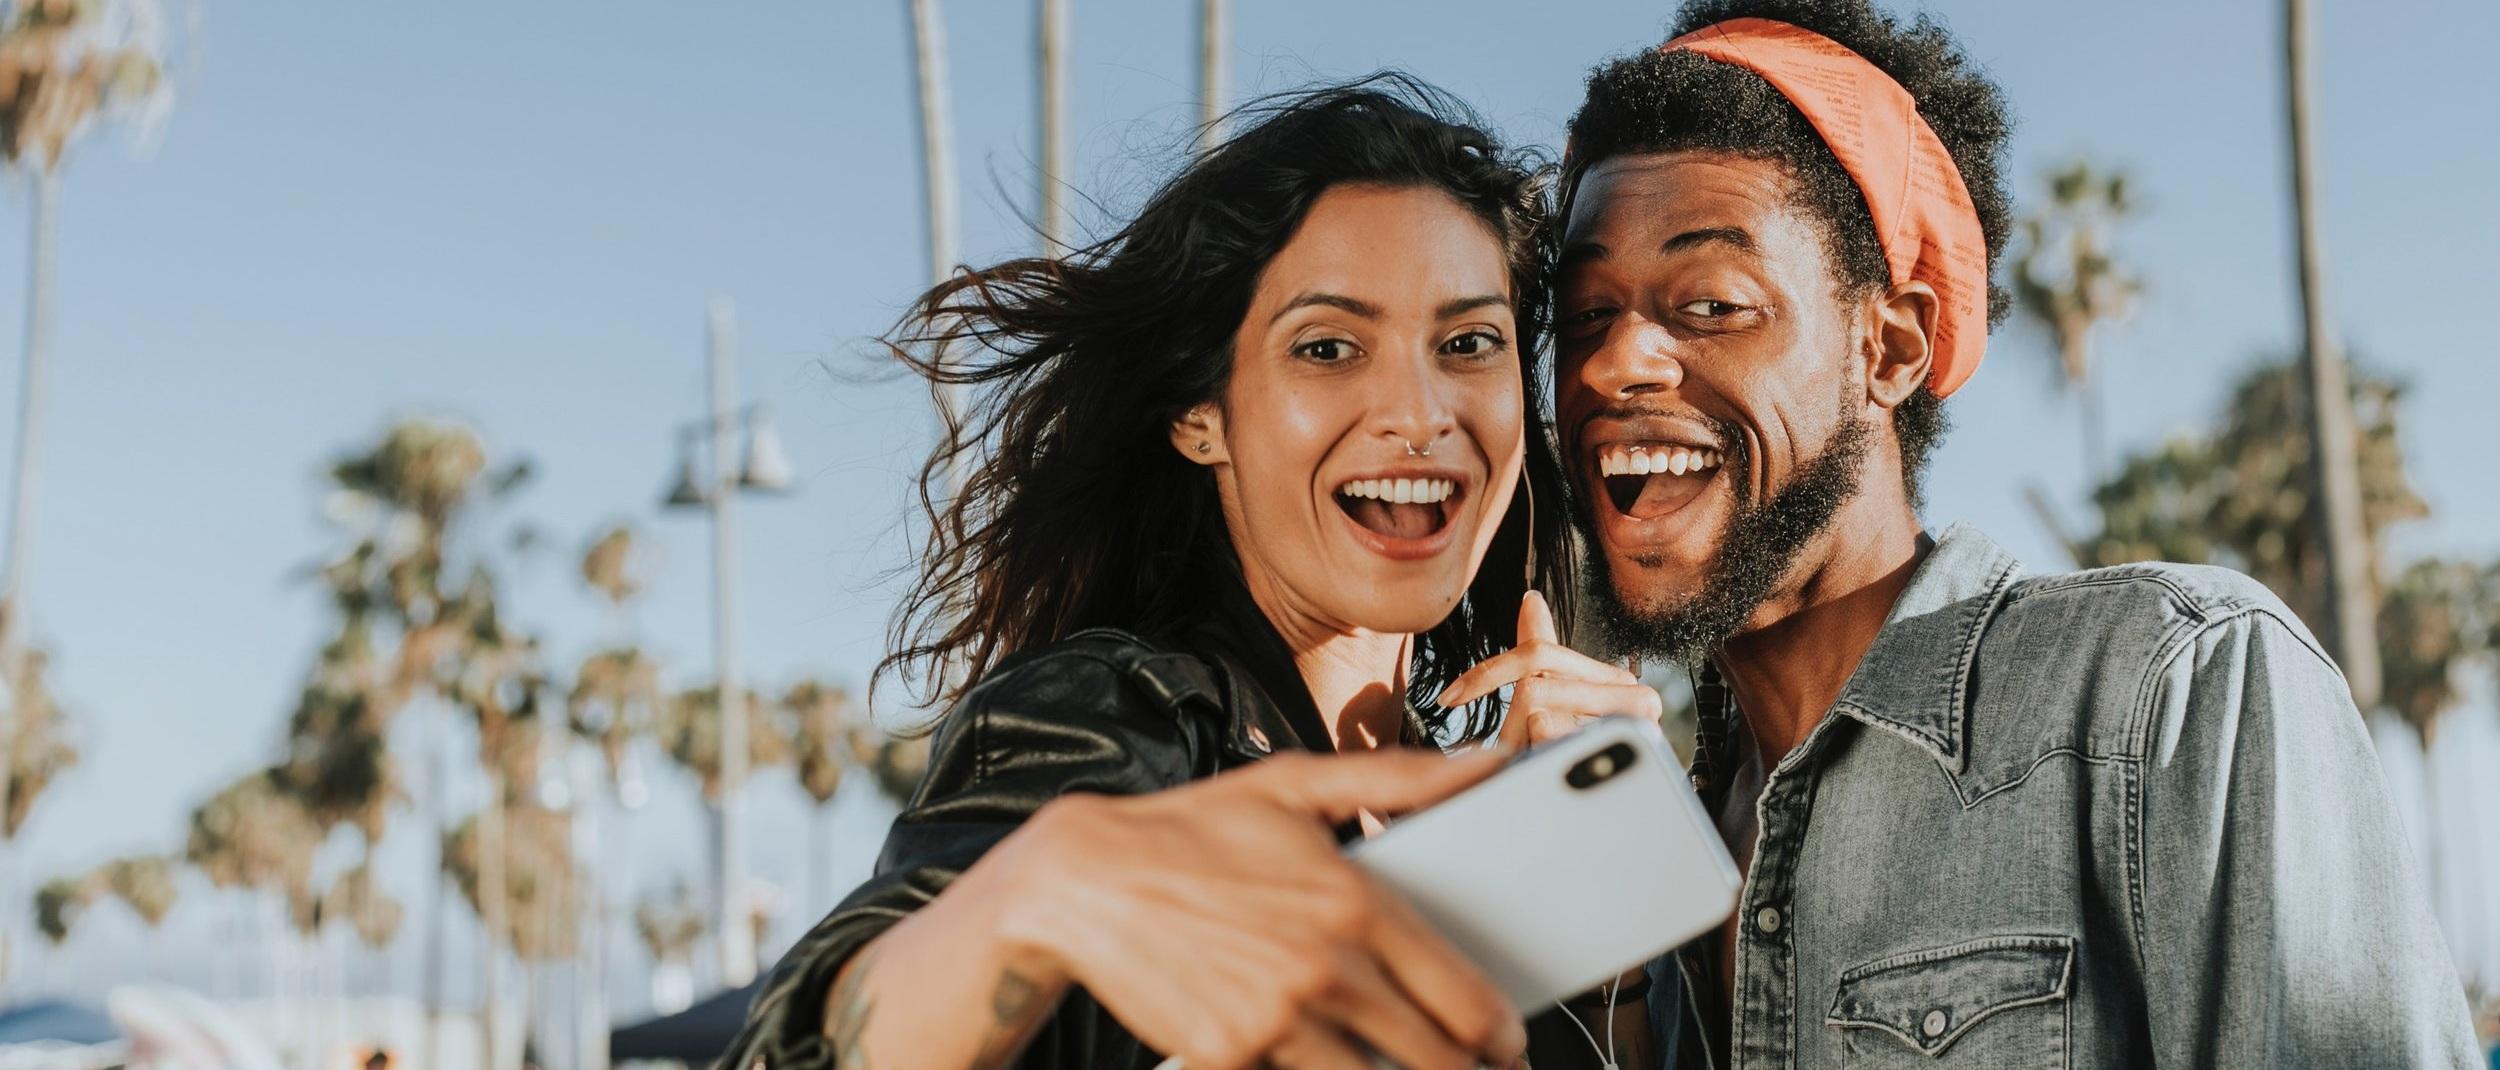 capturing-cheerful-couple-1371176.jpg